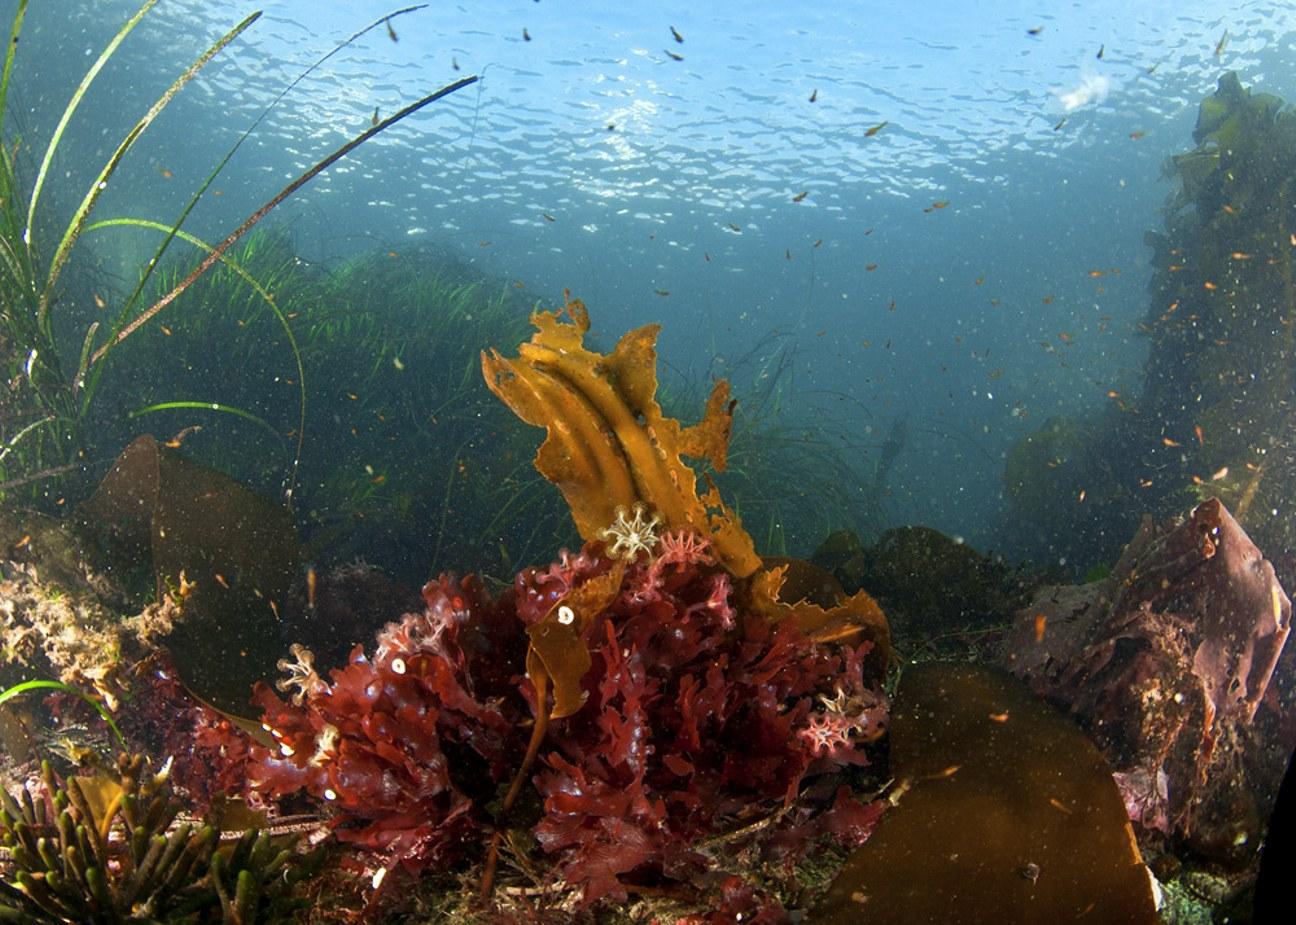 Box Jellyfish Habitat Tropical And Subtropical Waters Medium